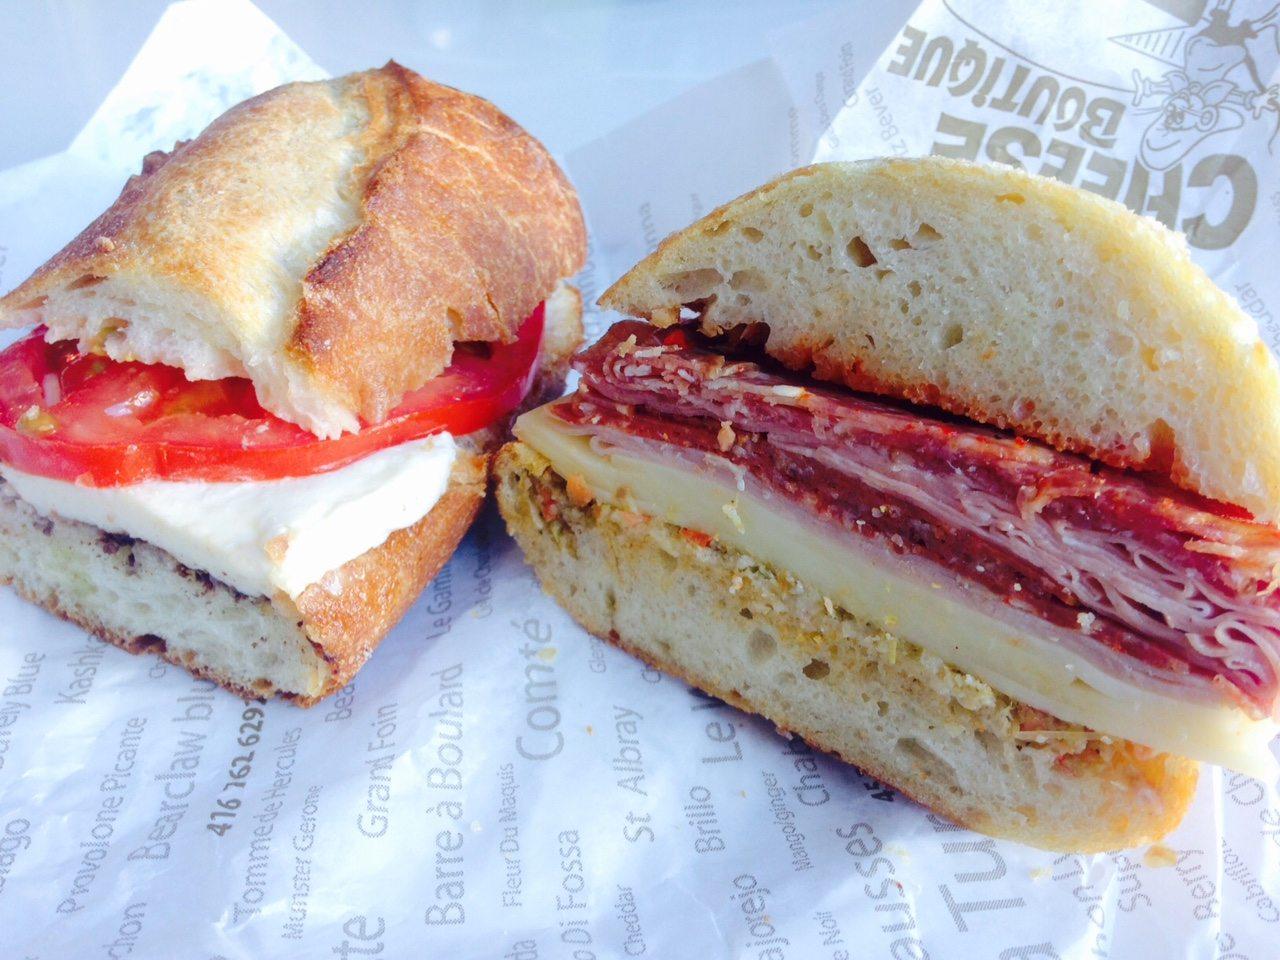 toronto-chefs-restaurants-consumed-bob-blumer-food-network-surreal-gourmet-cheese-boutique-muffuletta